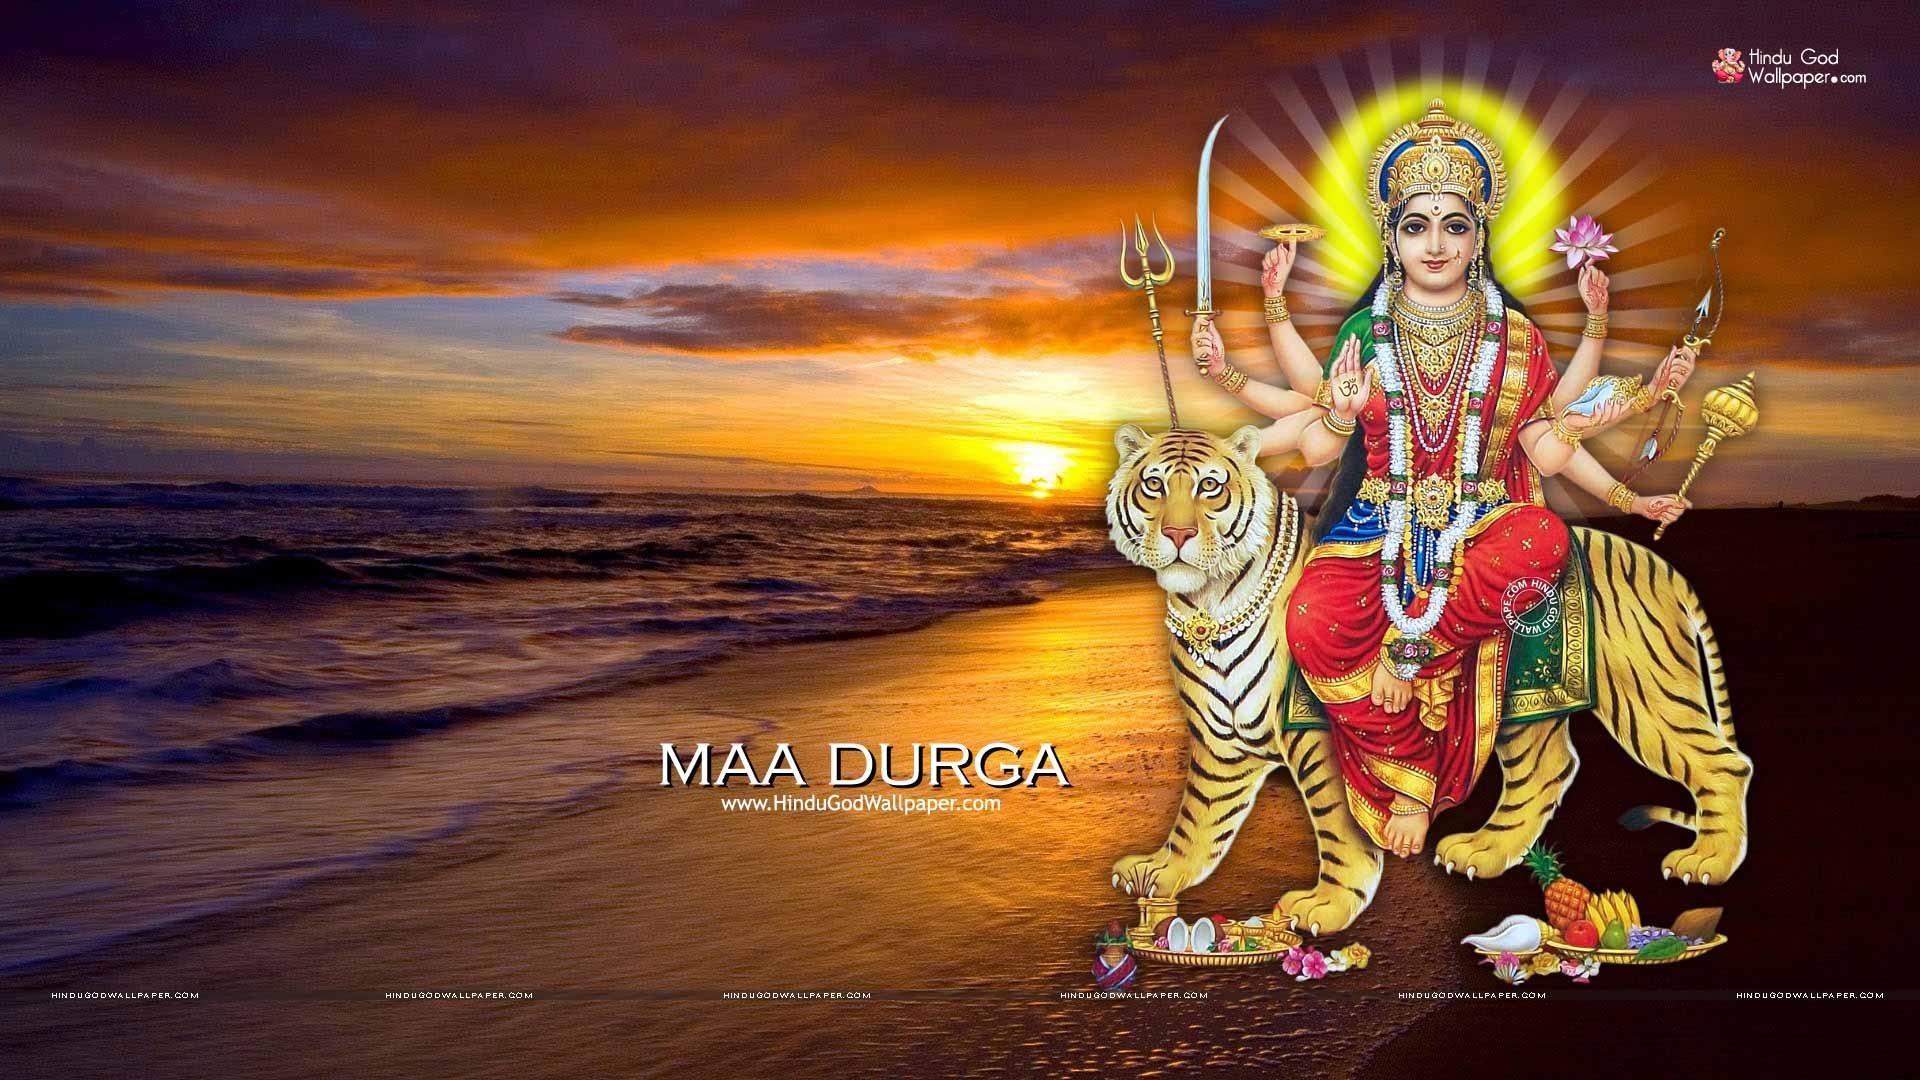 1920x1080 Maa Durga Hd Wallpaper 1080p Images Free Download